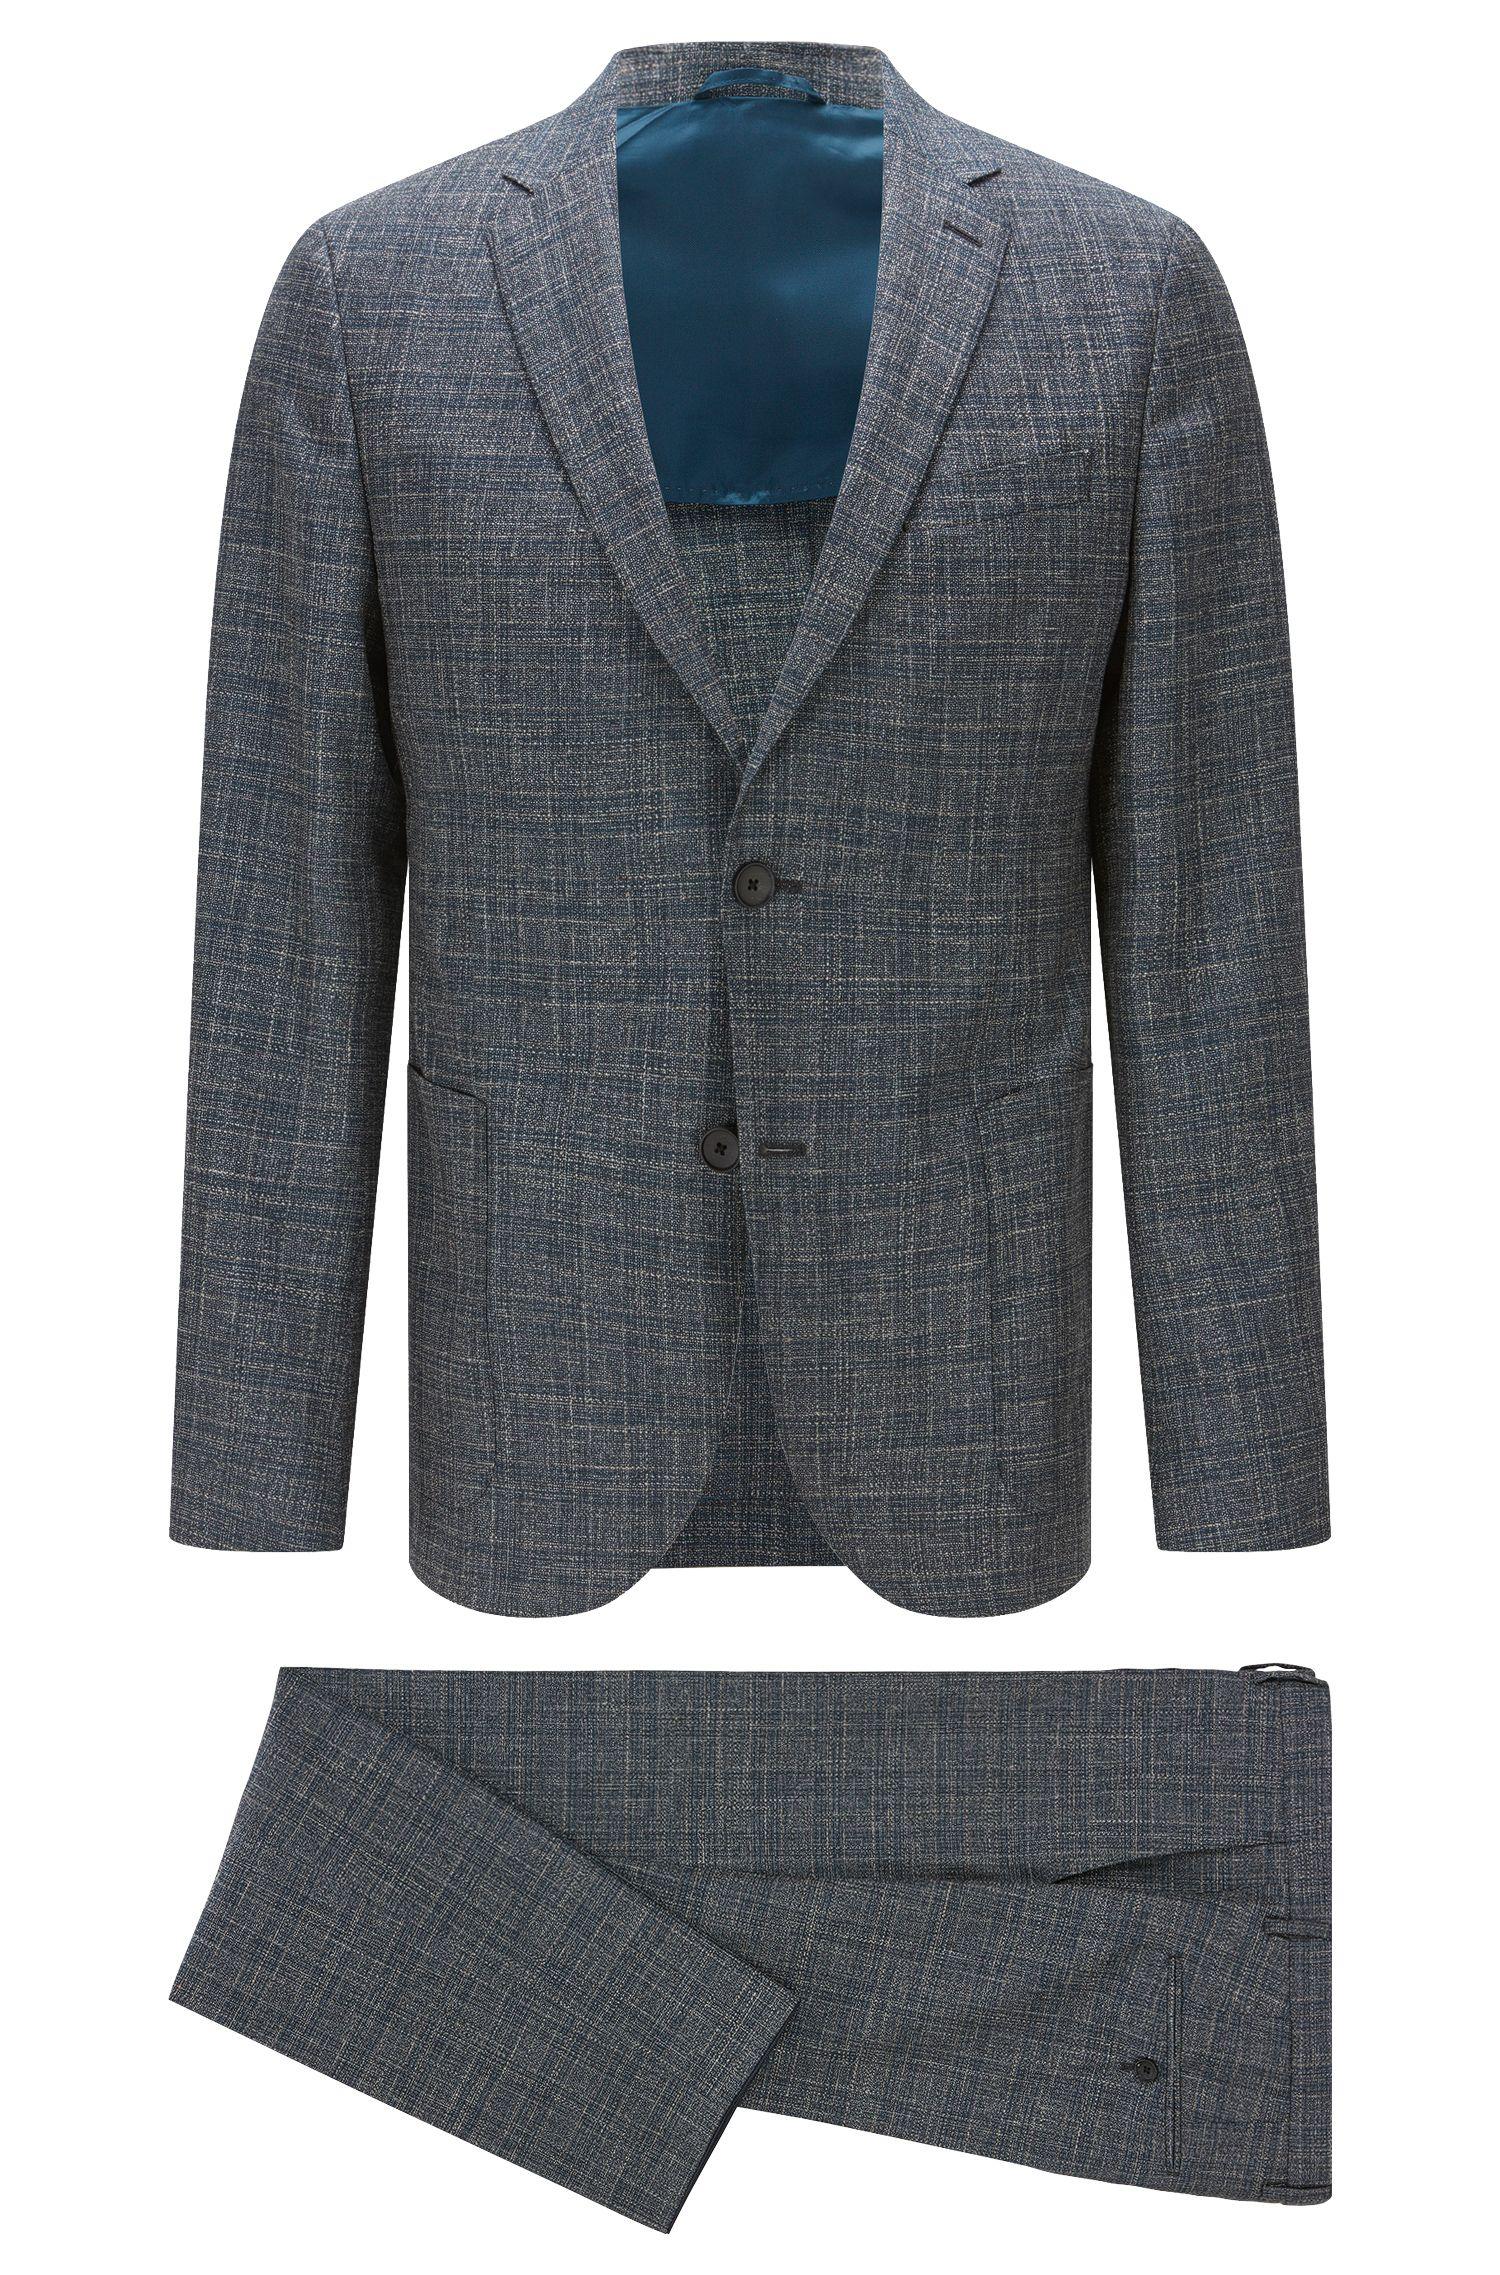 Virgin Wool Blend Suit, Slim Fit | Nalton/Bennno